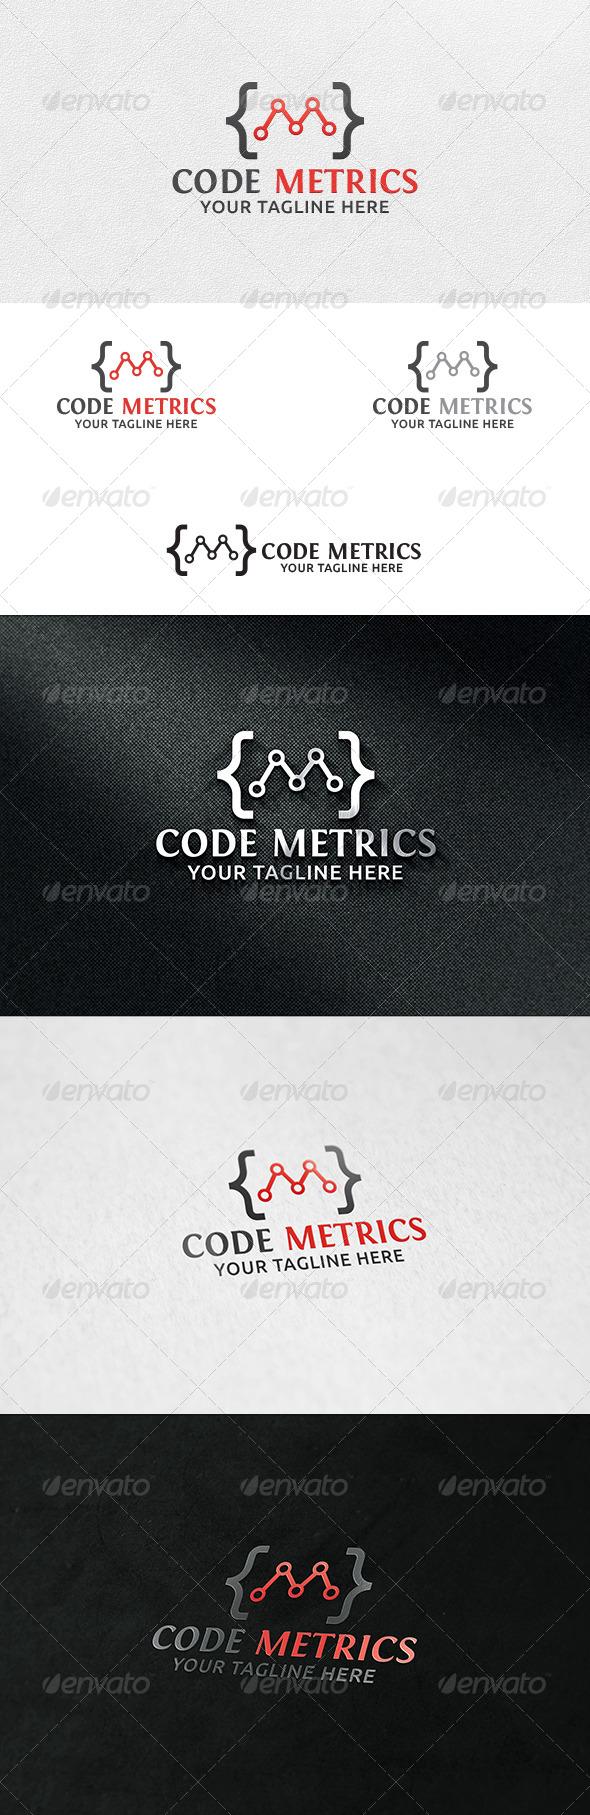 GraphicRiver Code Metrics Logo Template 6713381